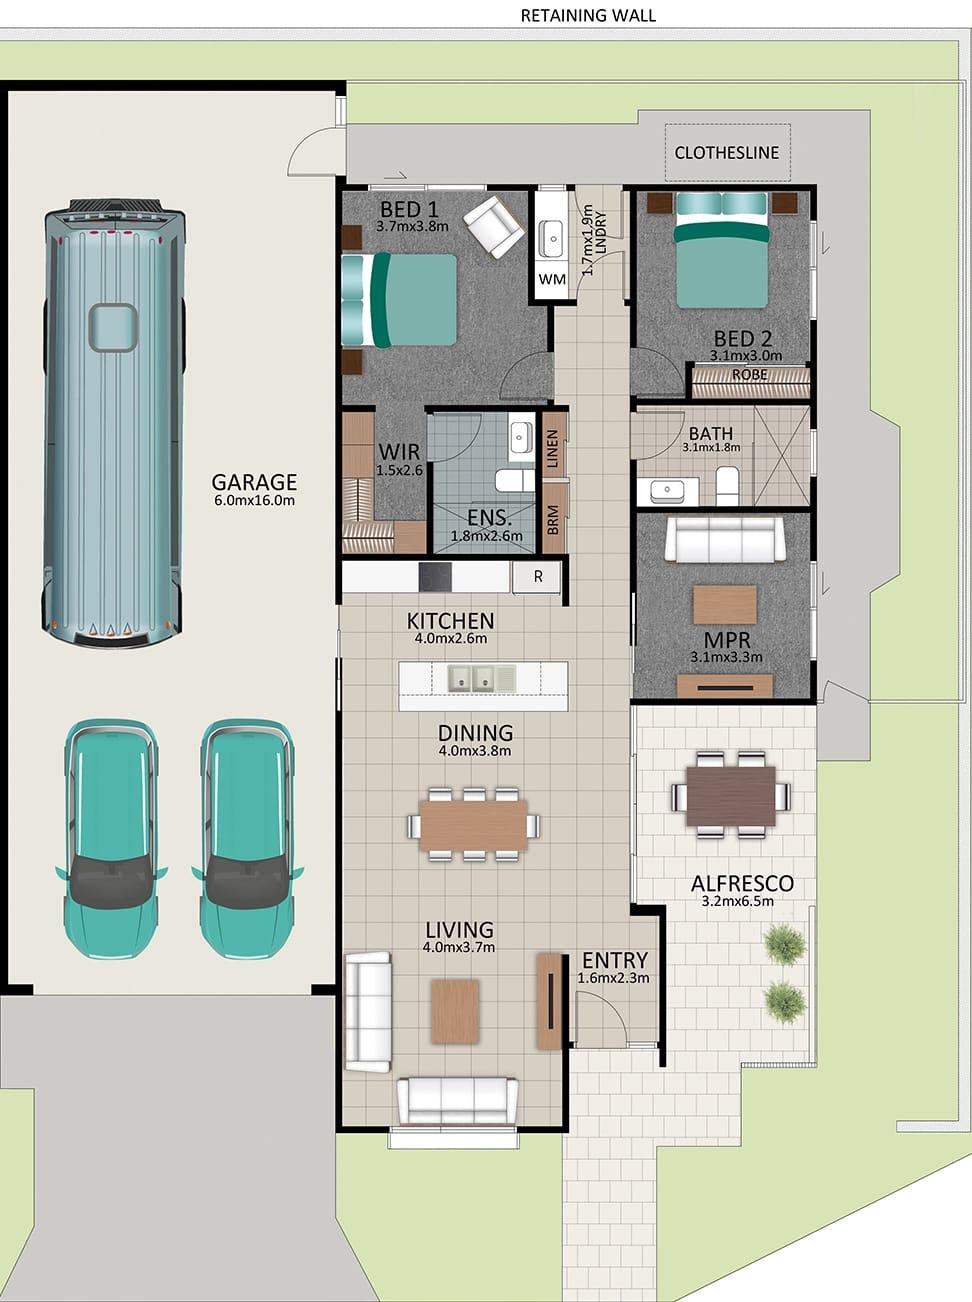 LAT25 Floorplan GAL OCT20 LOT 217 - Lot 217